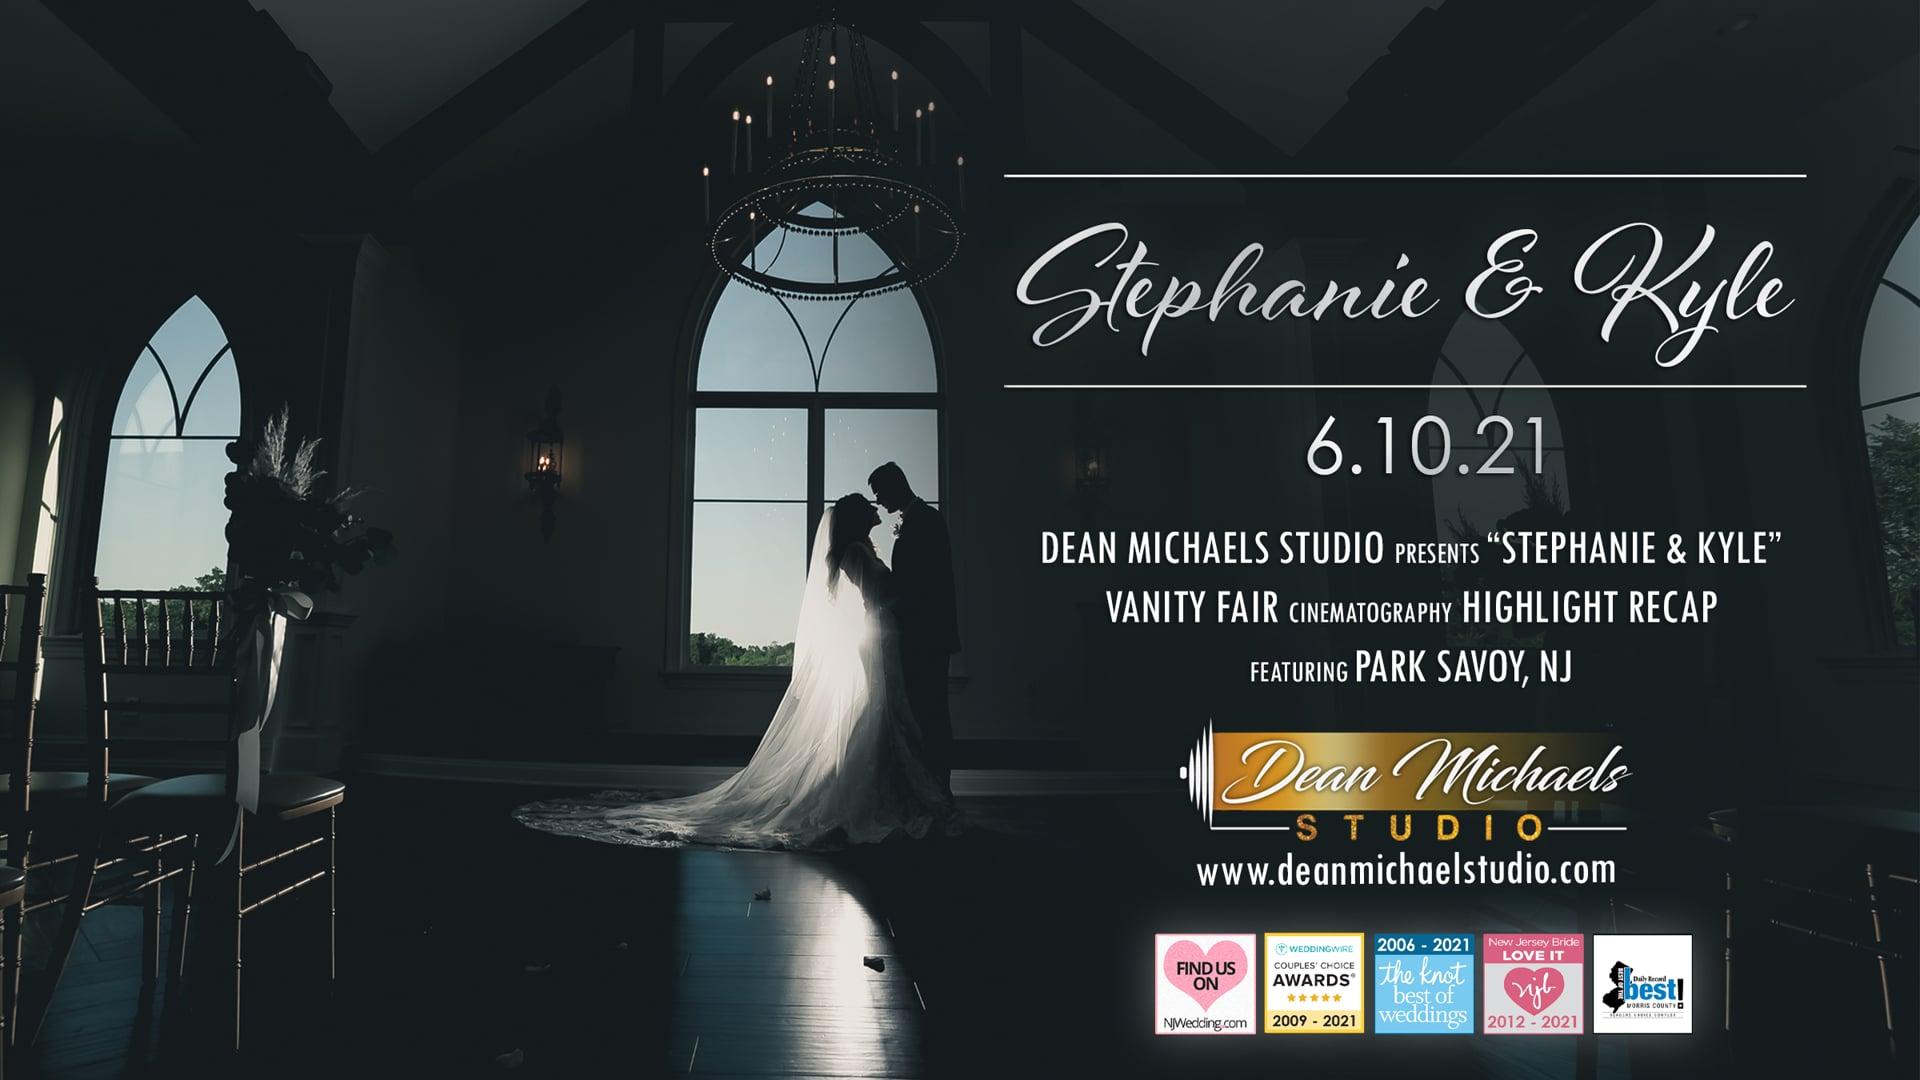 Stephanie & Kyle's Wedding Highlight Recap at The Park Savoy, NJ